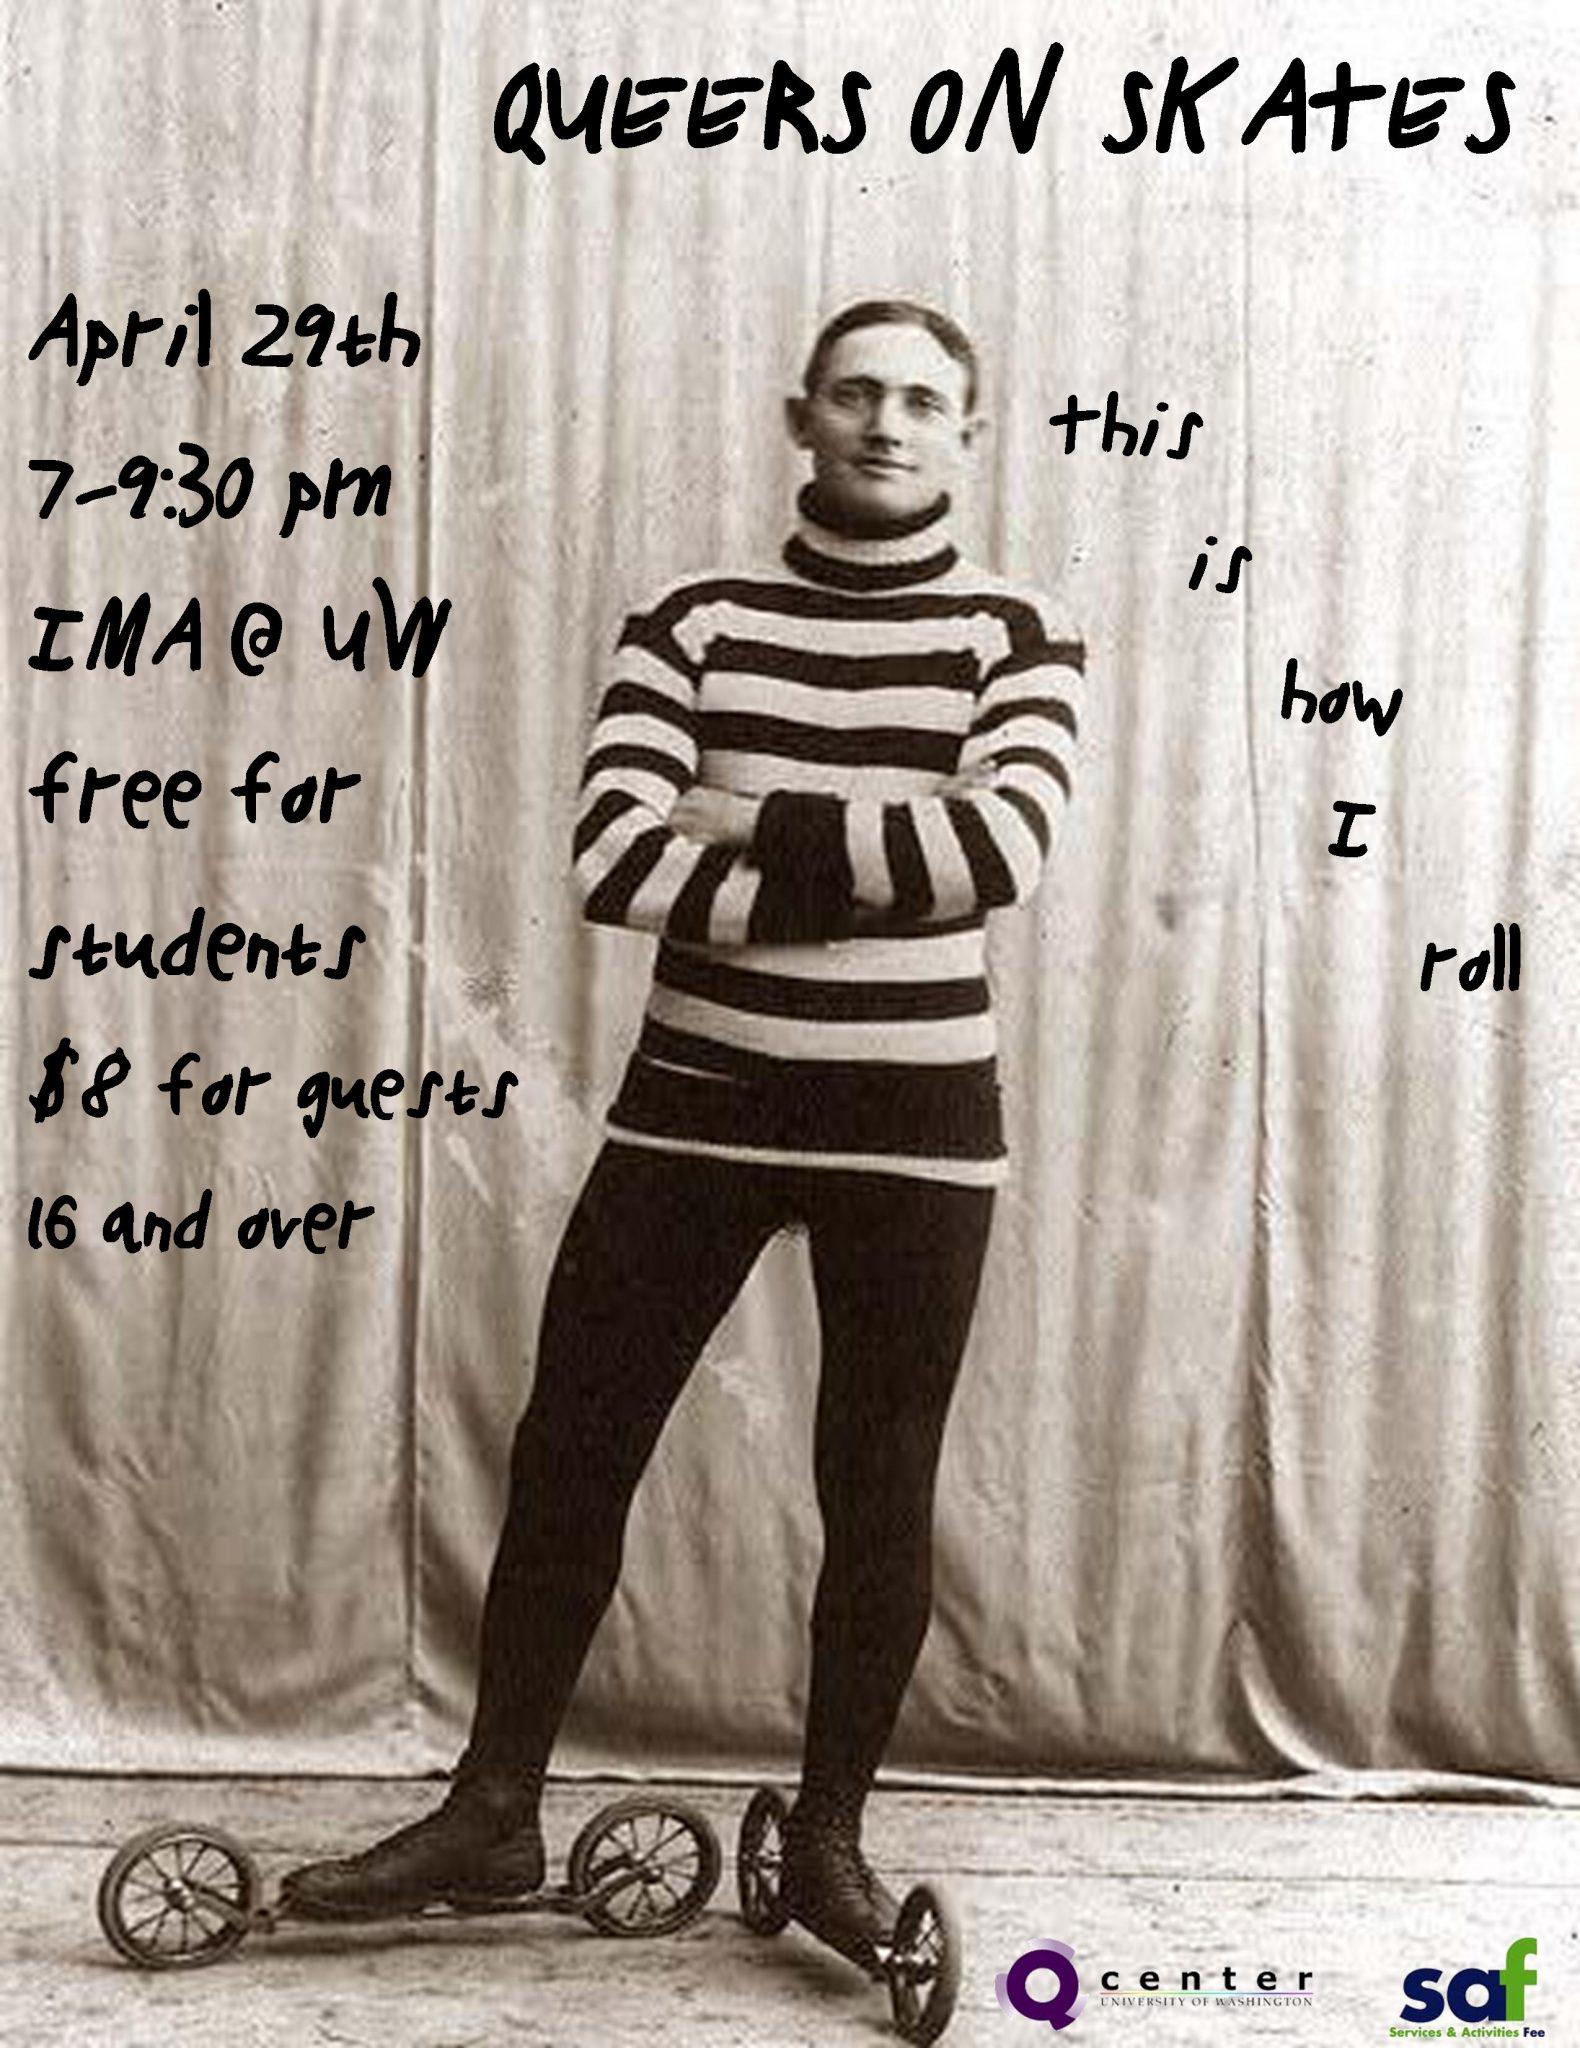 queers on skates, april 29th, uw ima